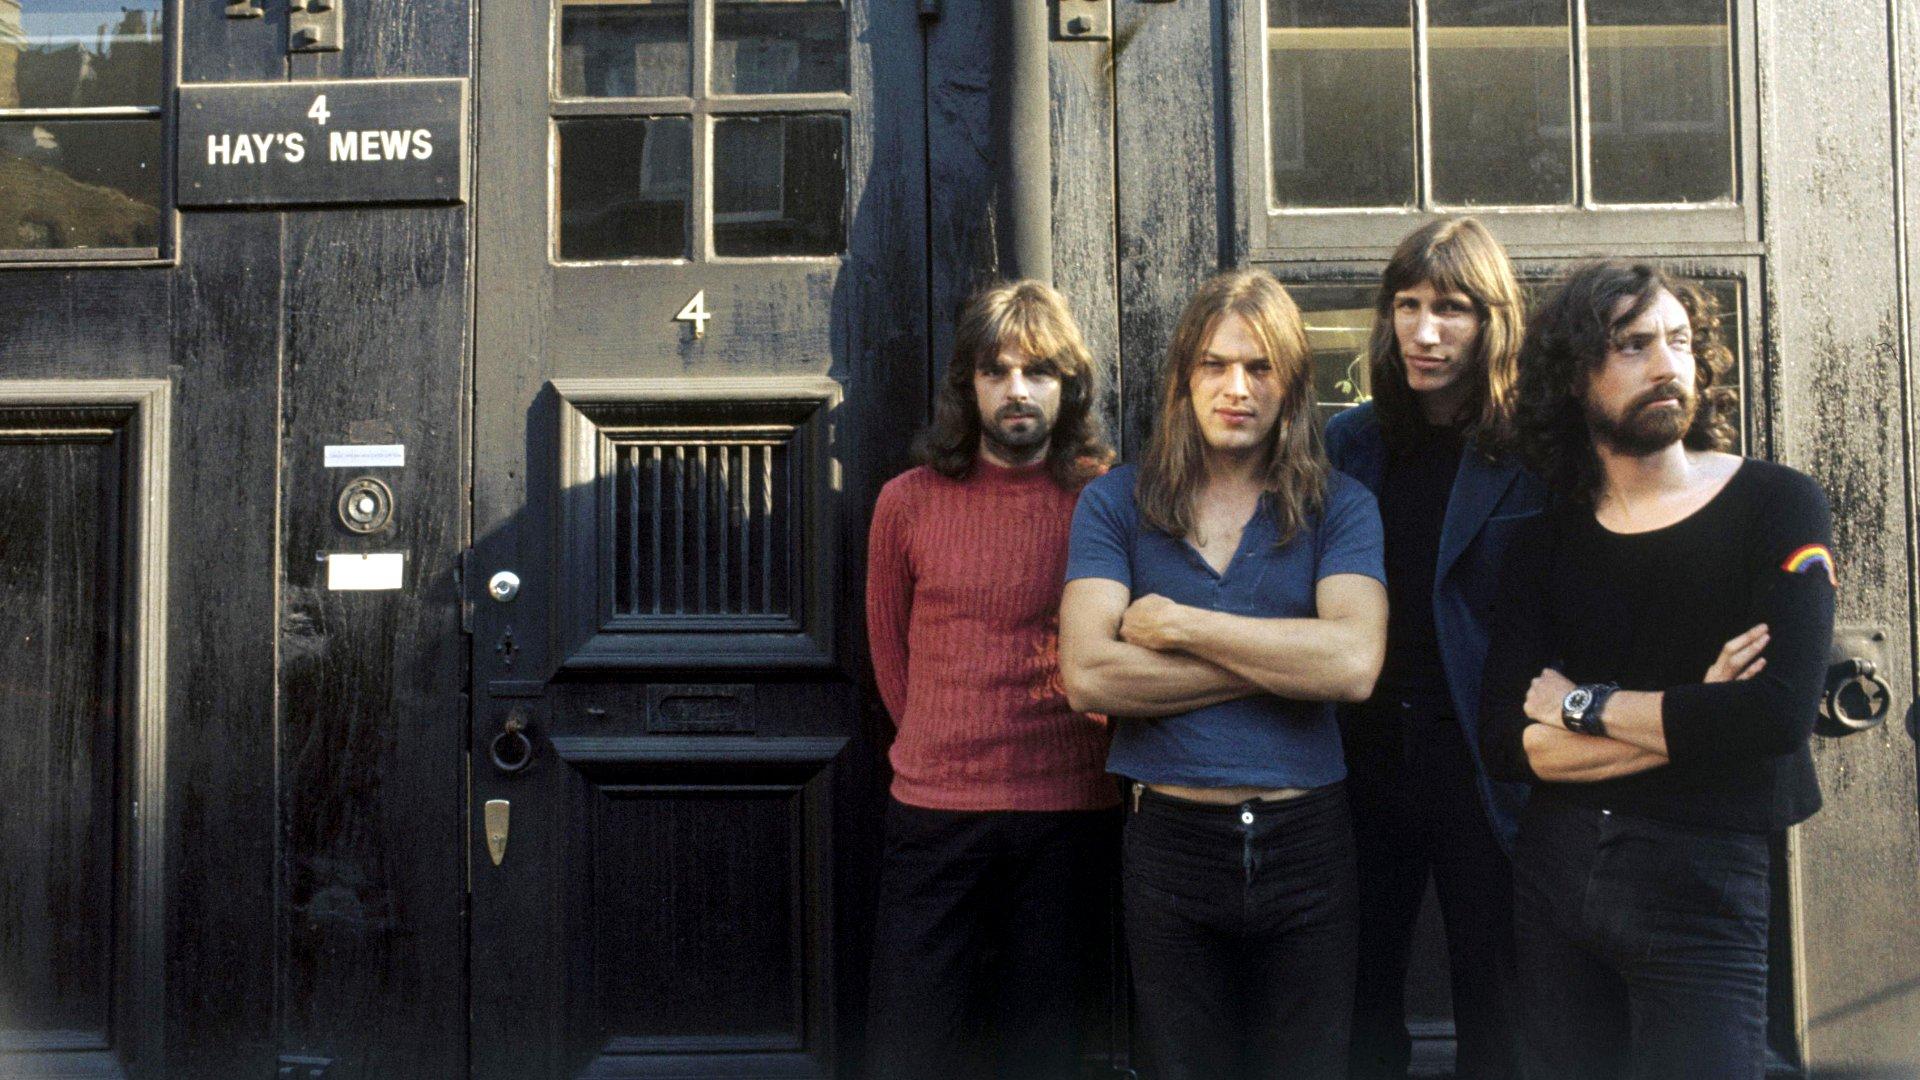 Music Pink Floyd Wallpaper - Resolution:1920x1080 - ID:108359 - wallha.com